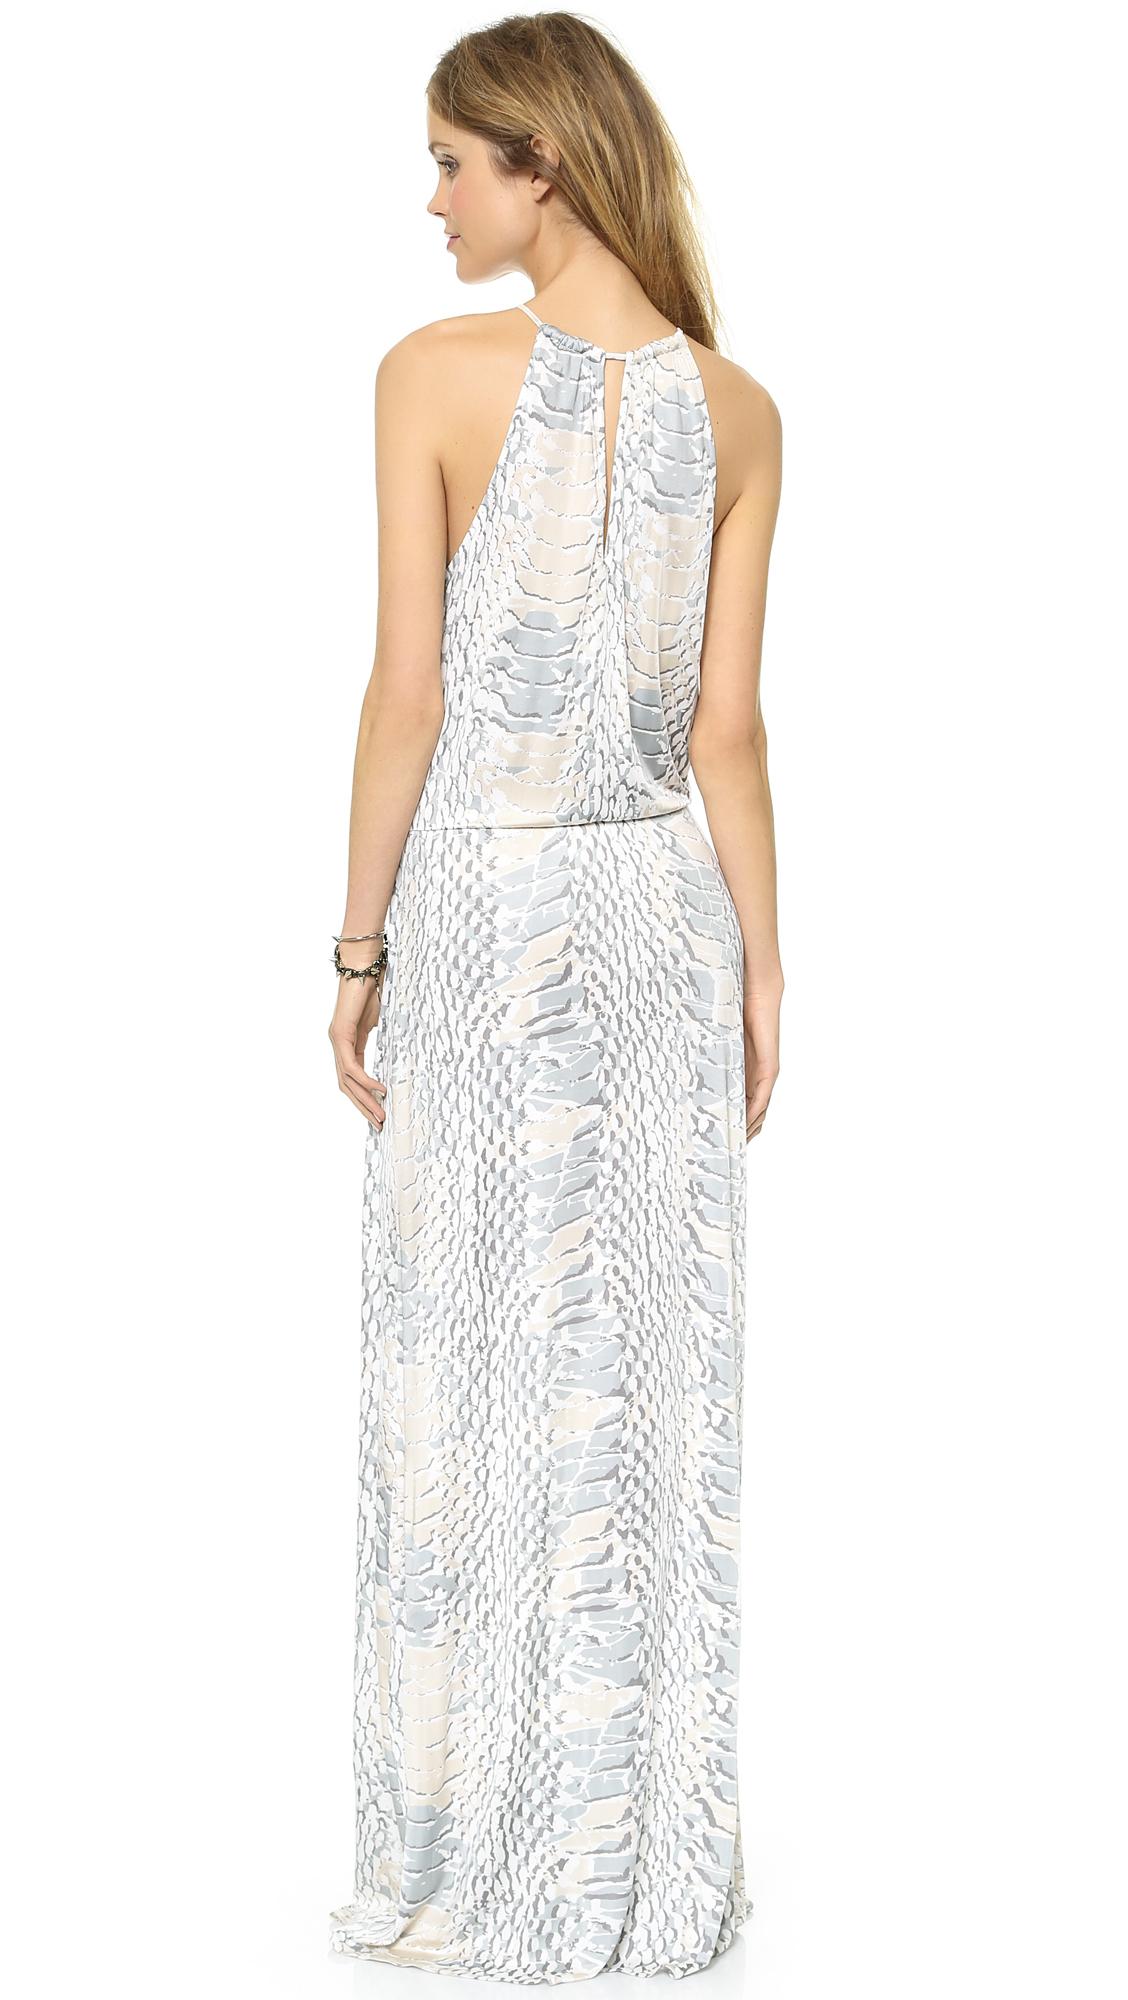 67f634c2ad23 Parker Madera Maxi Dress - Python in Gray - Lyst